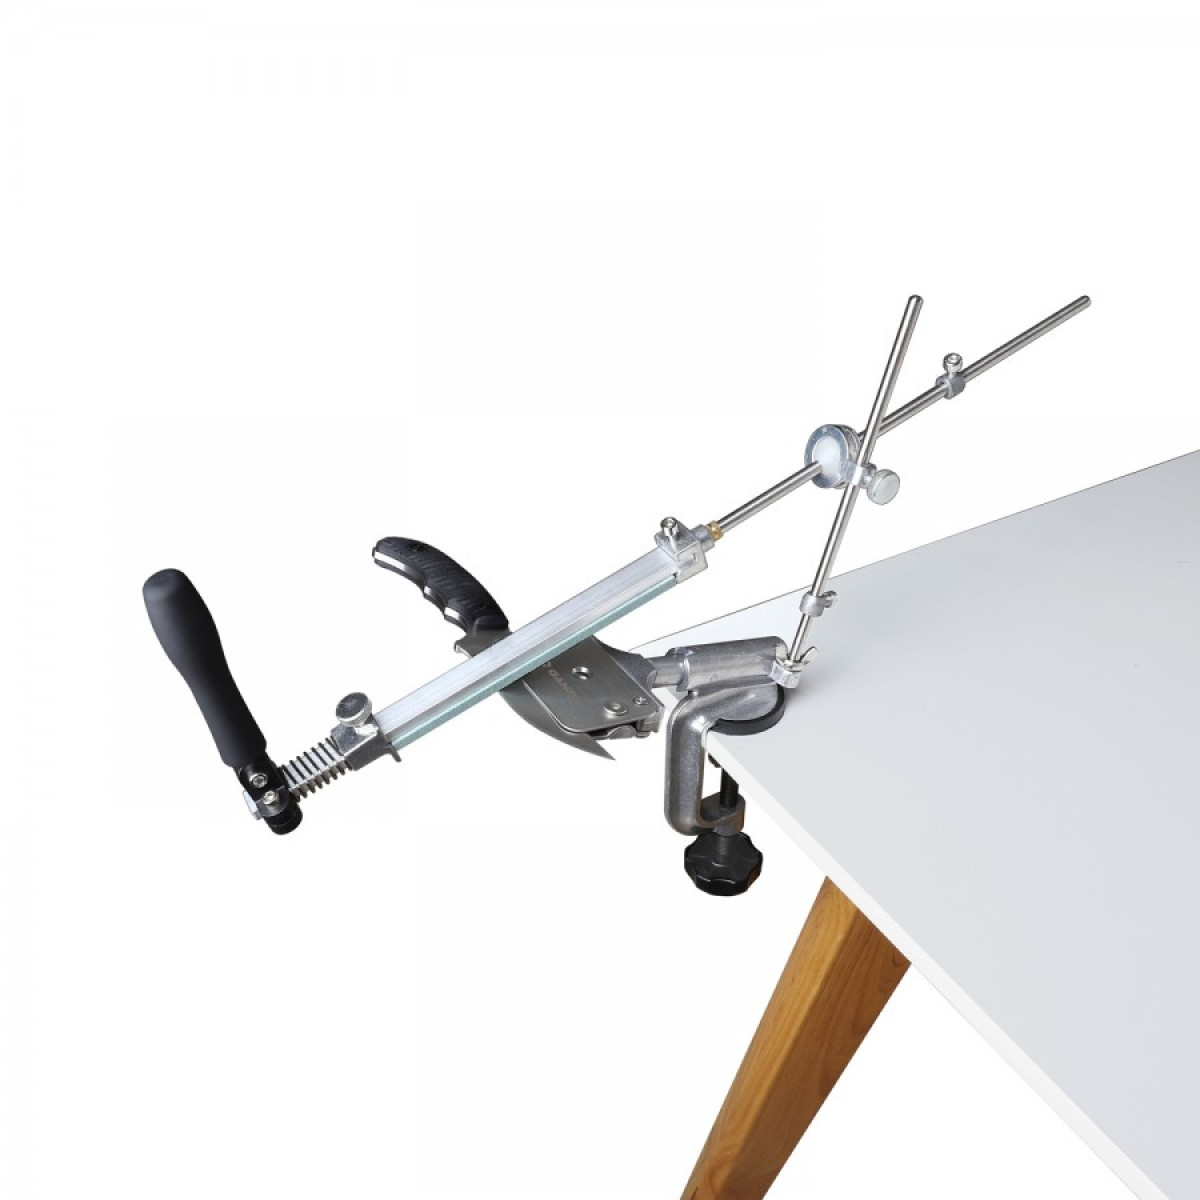 Ganzo Razor Pro Knife Sharpener Sharpening Kit